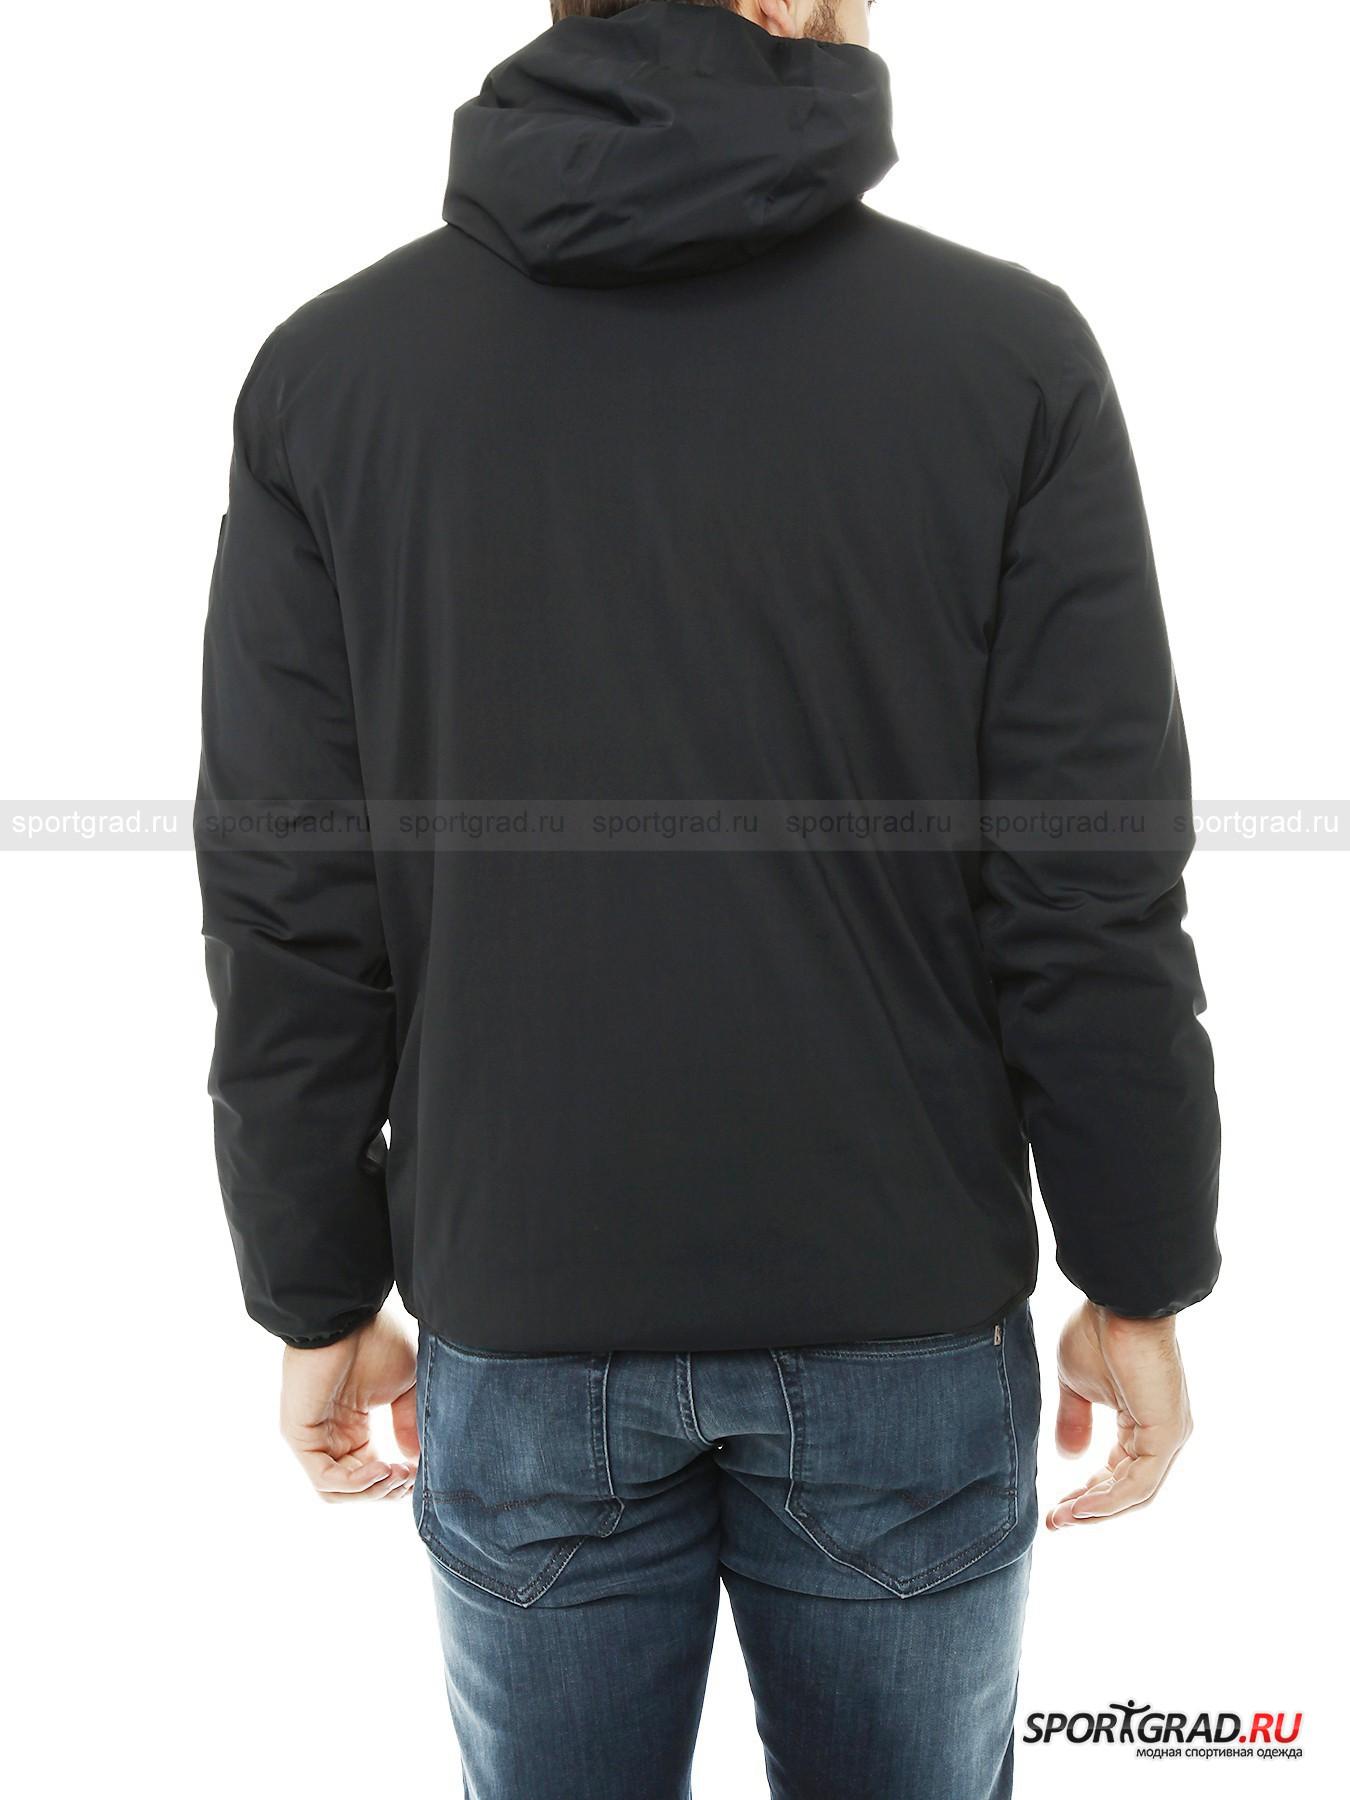 Куртка муж.EMPORIO ARMANI от Спортград